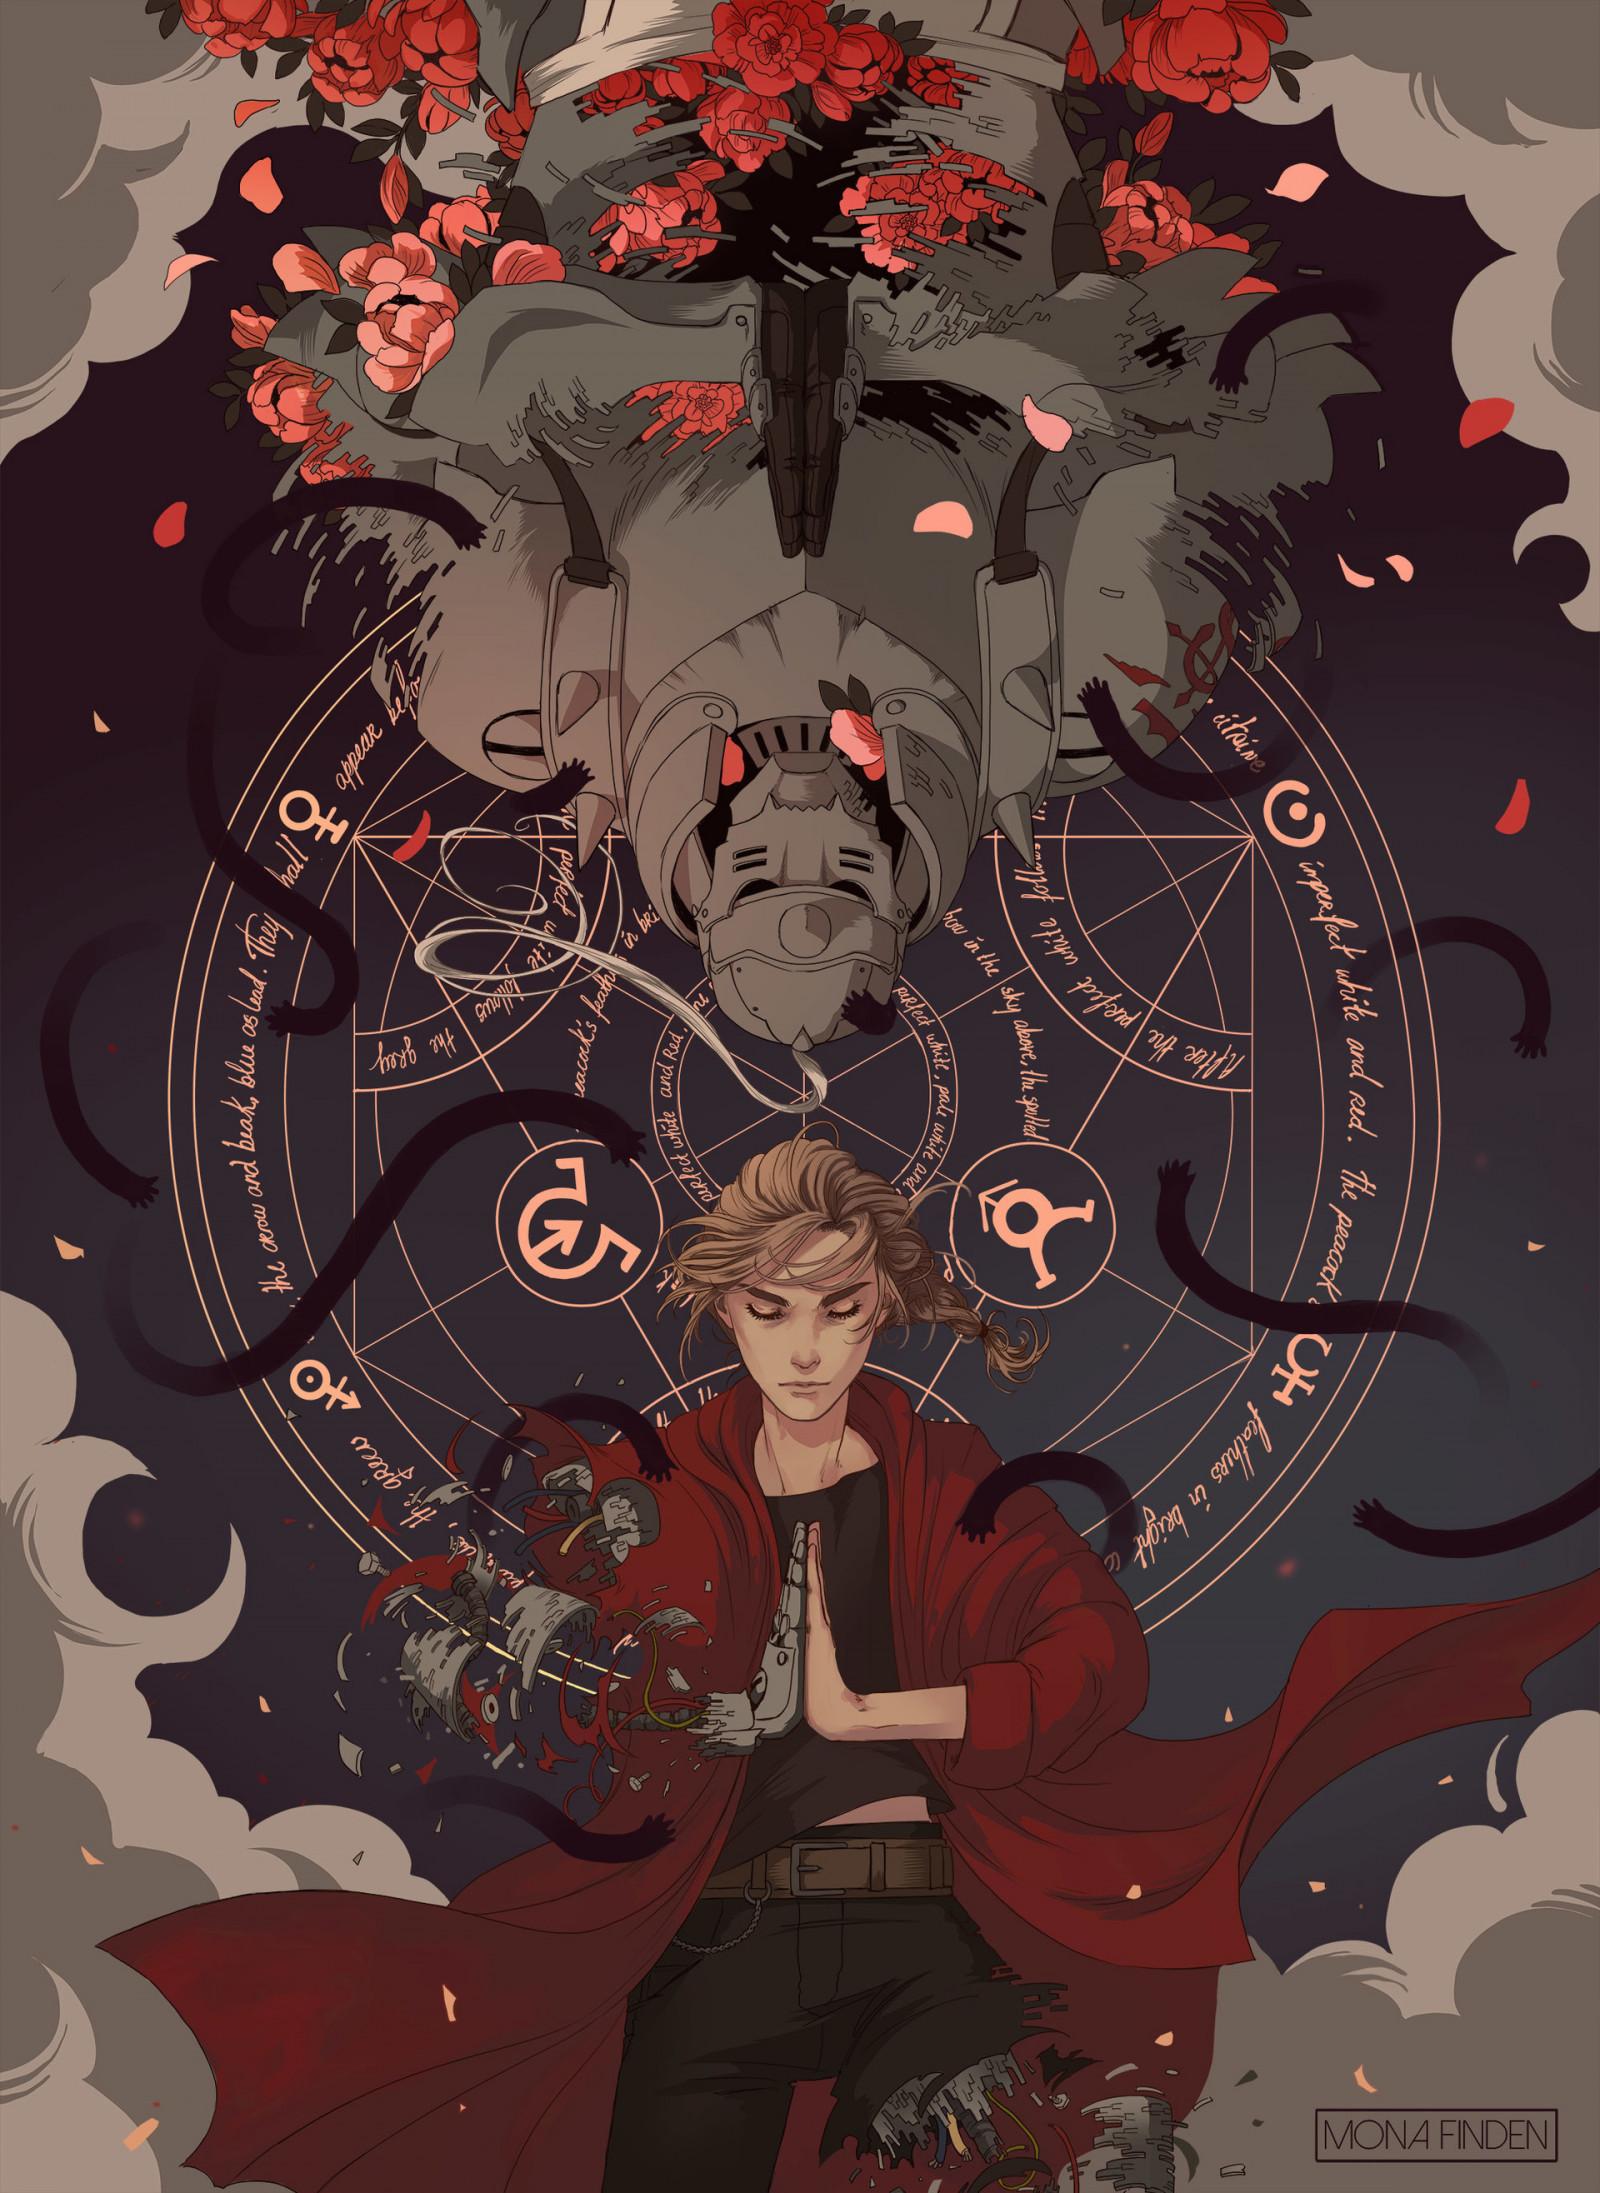 Wallpaper Mona Finden Elric Edward Elric Alphonse Full Metal